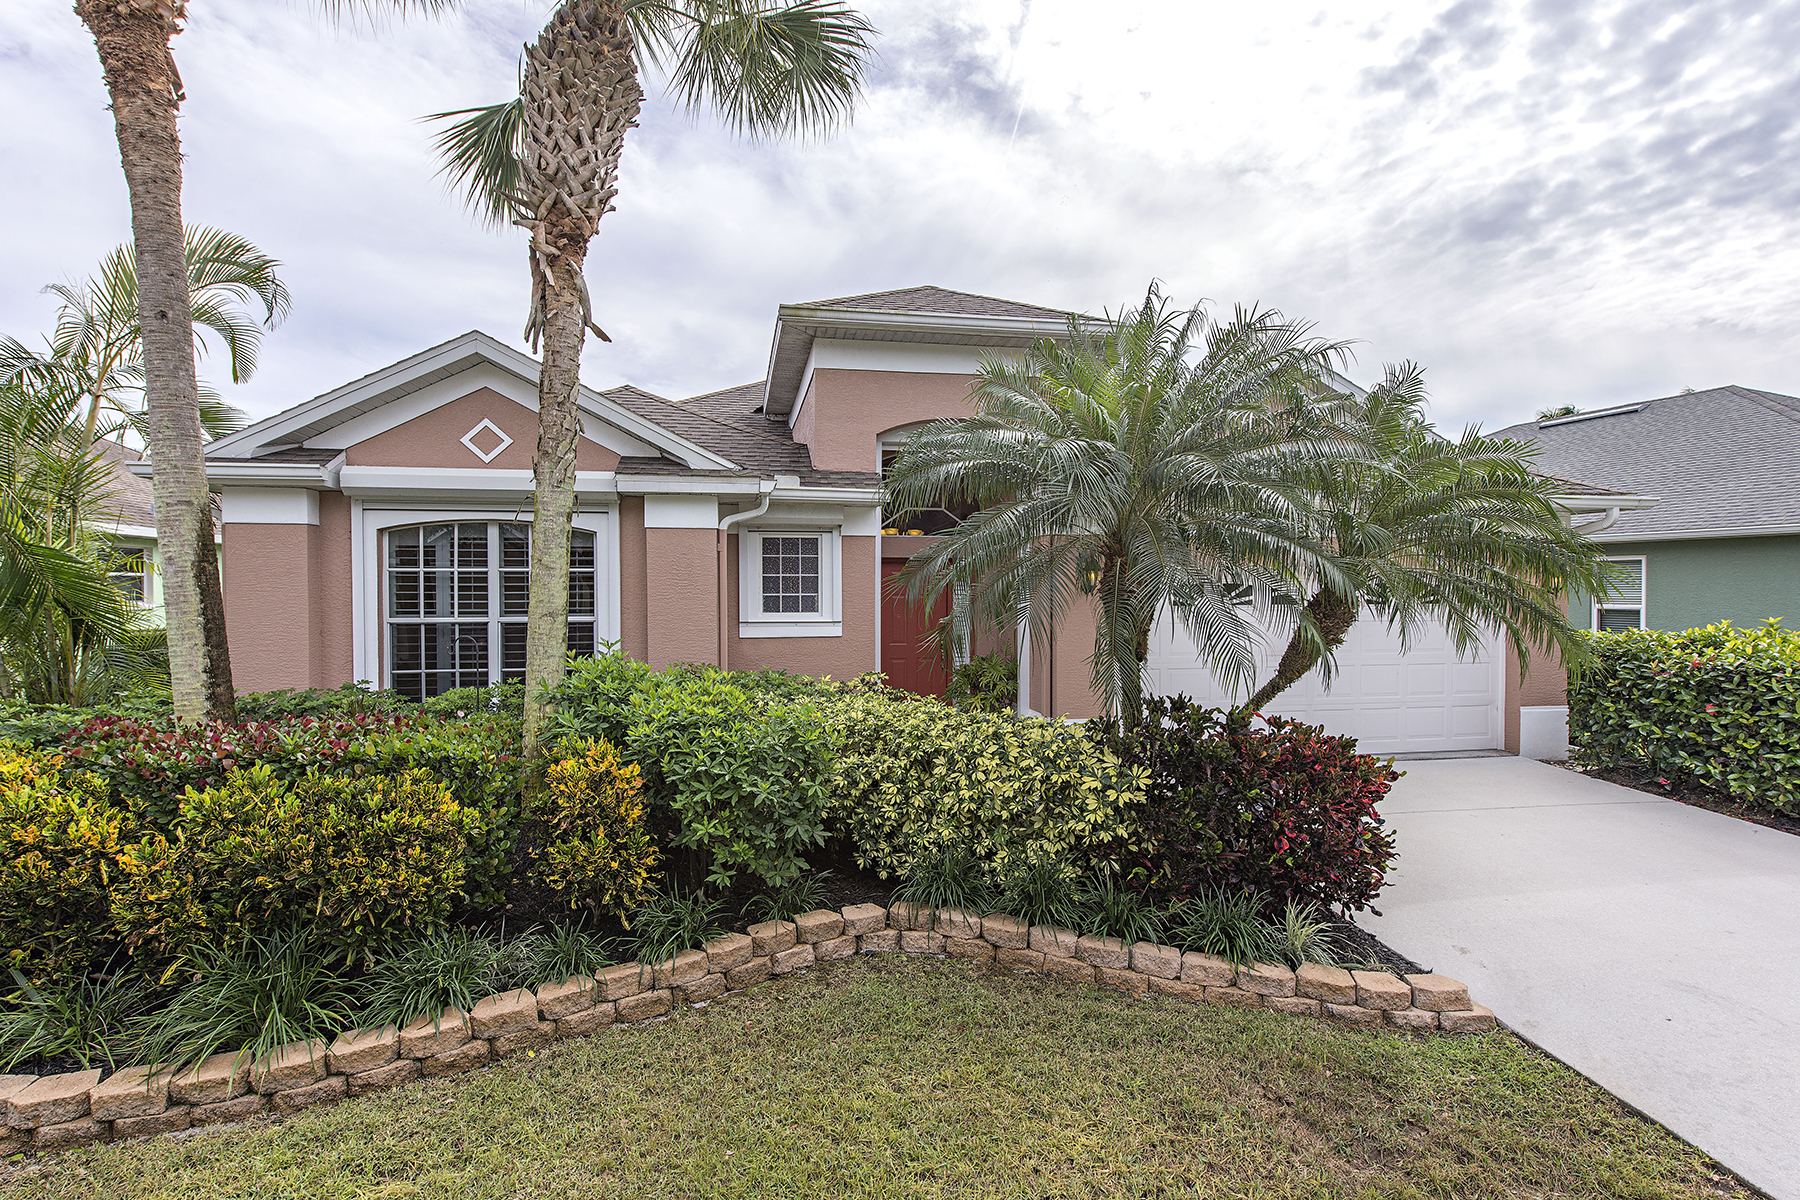 sales property at 23151 Marsh Landing Blvd , Estero, FL 33928